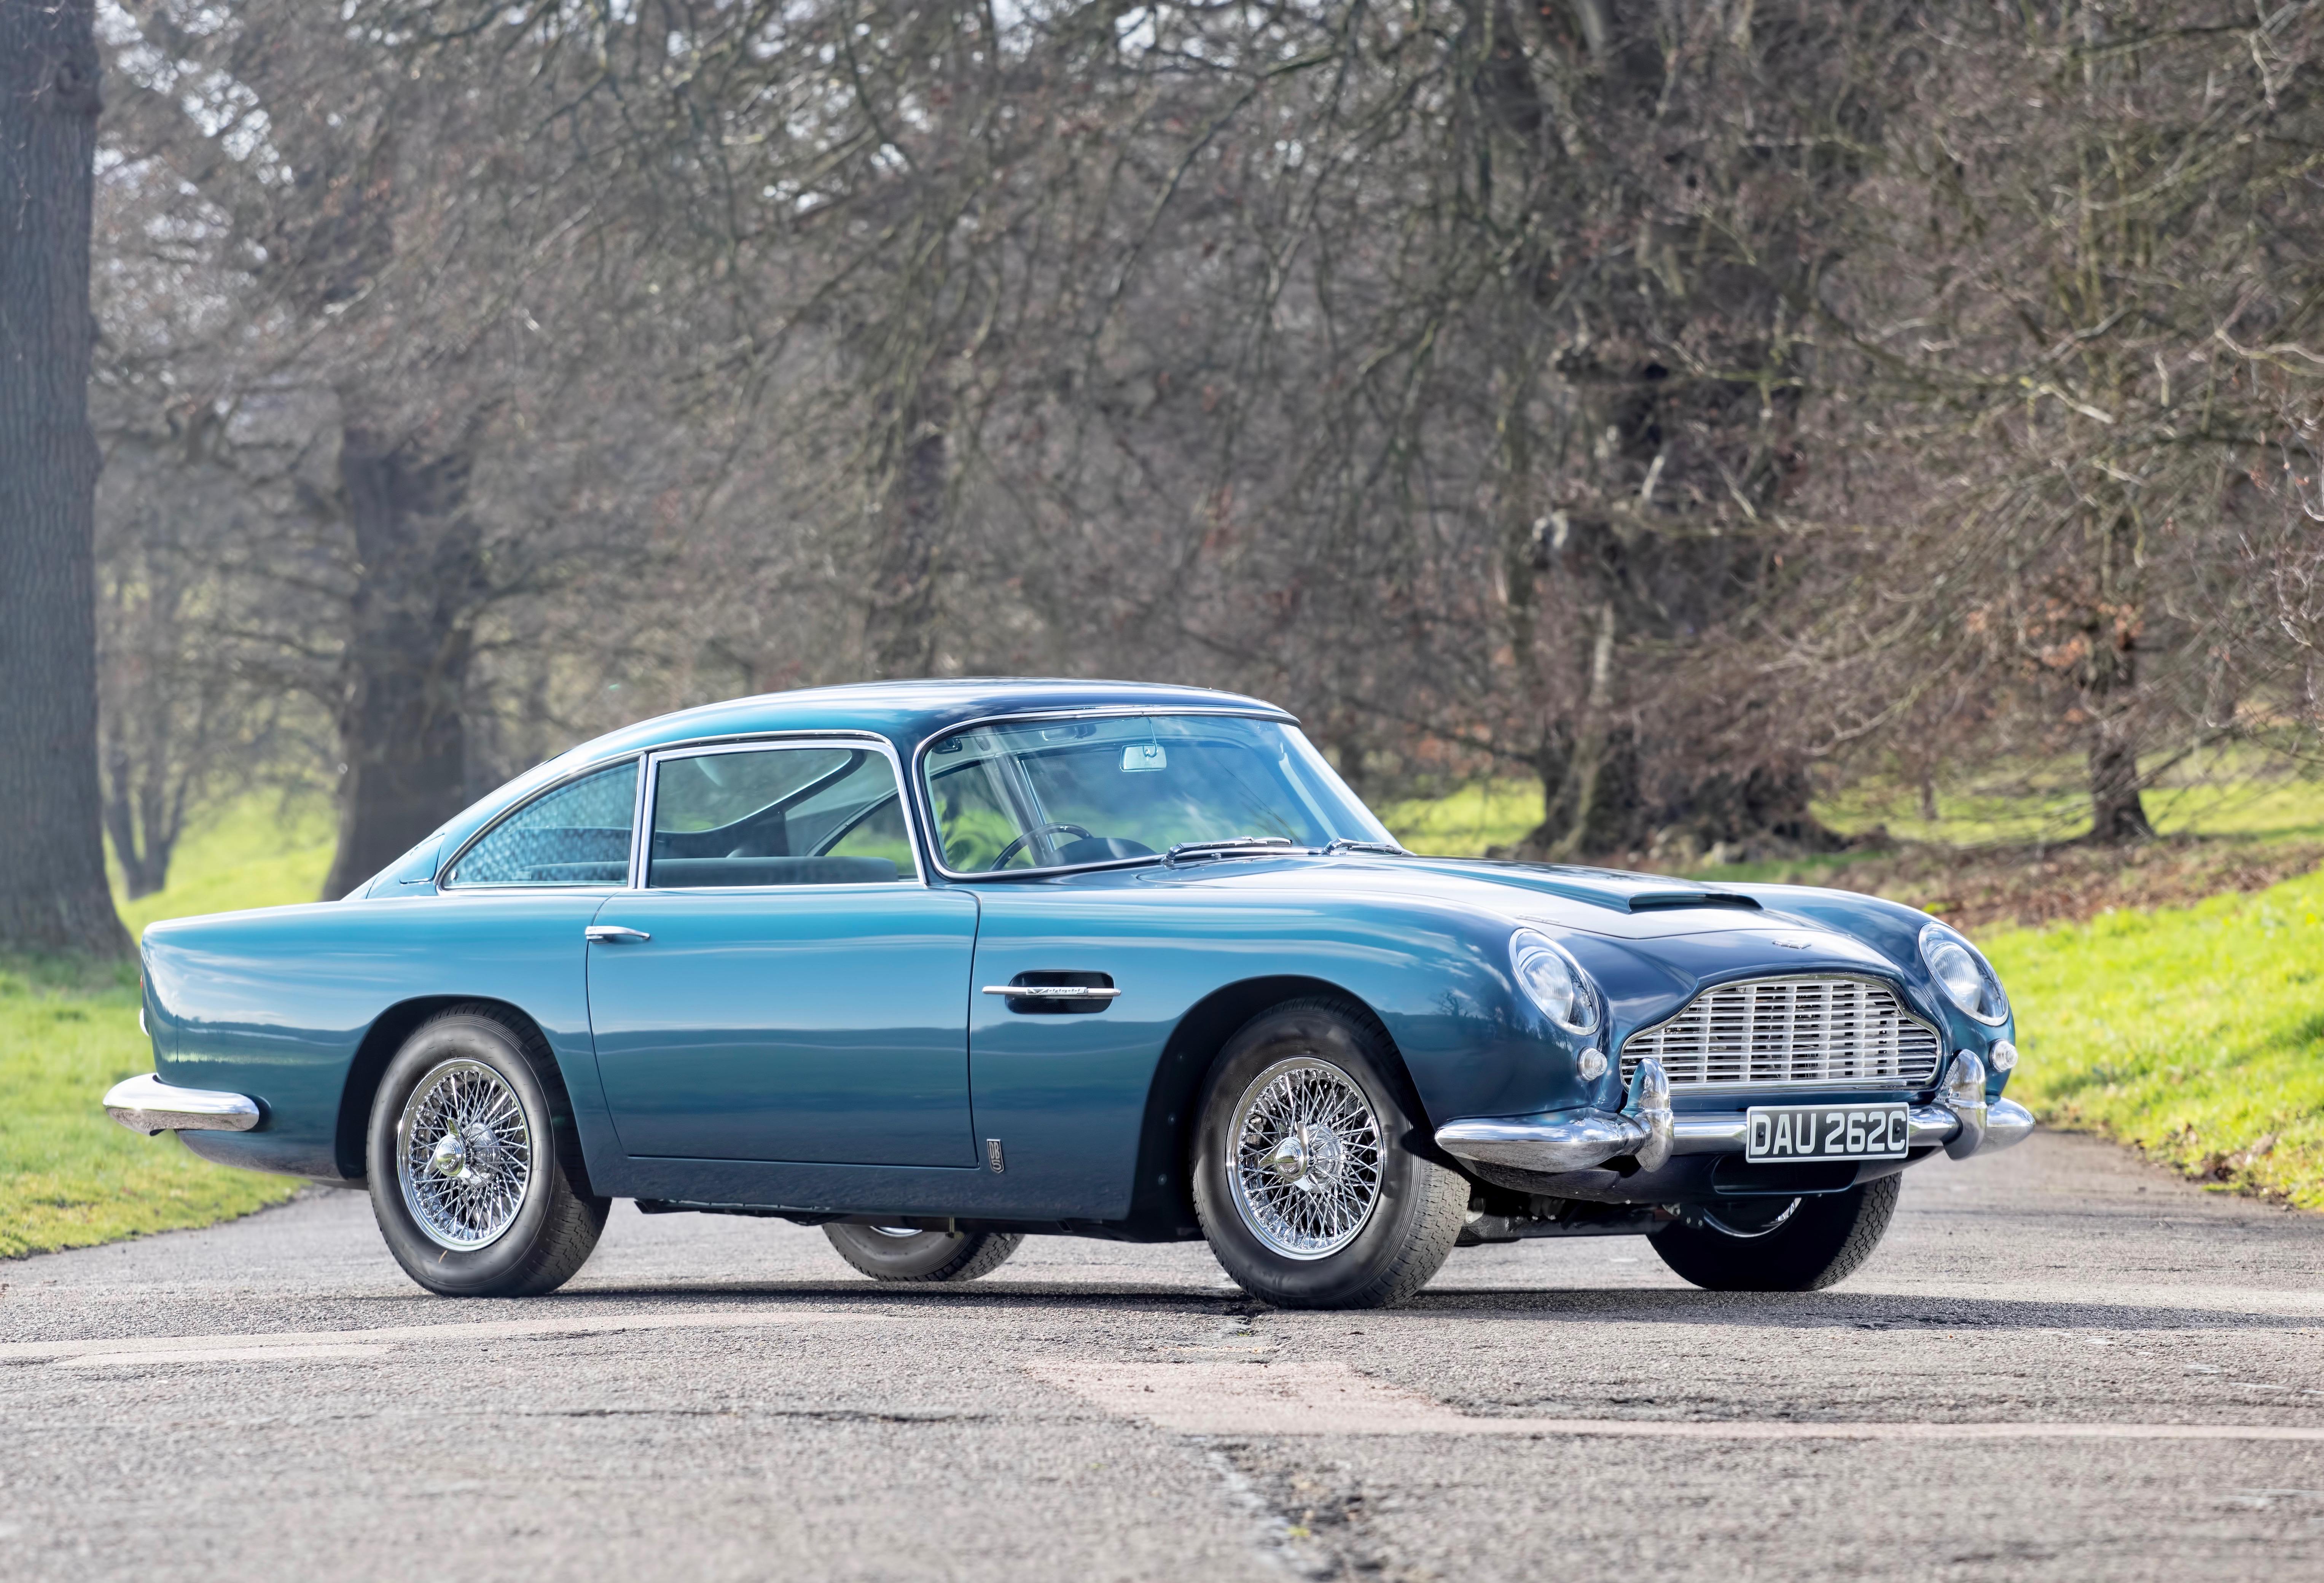 Upgraded Aston Martin Db5 Tops Bonhams Auction At Goodwood